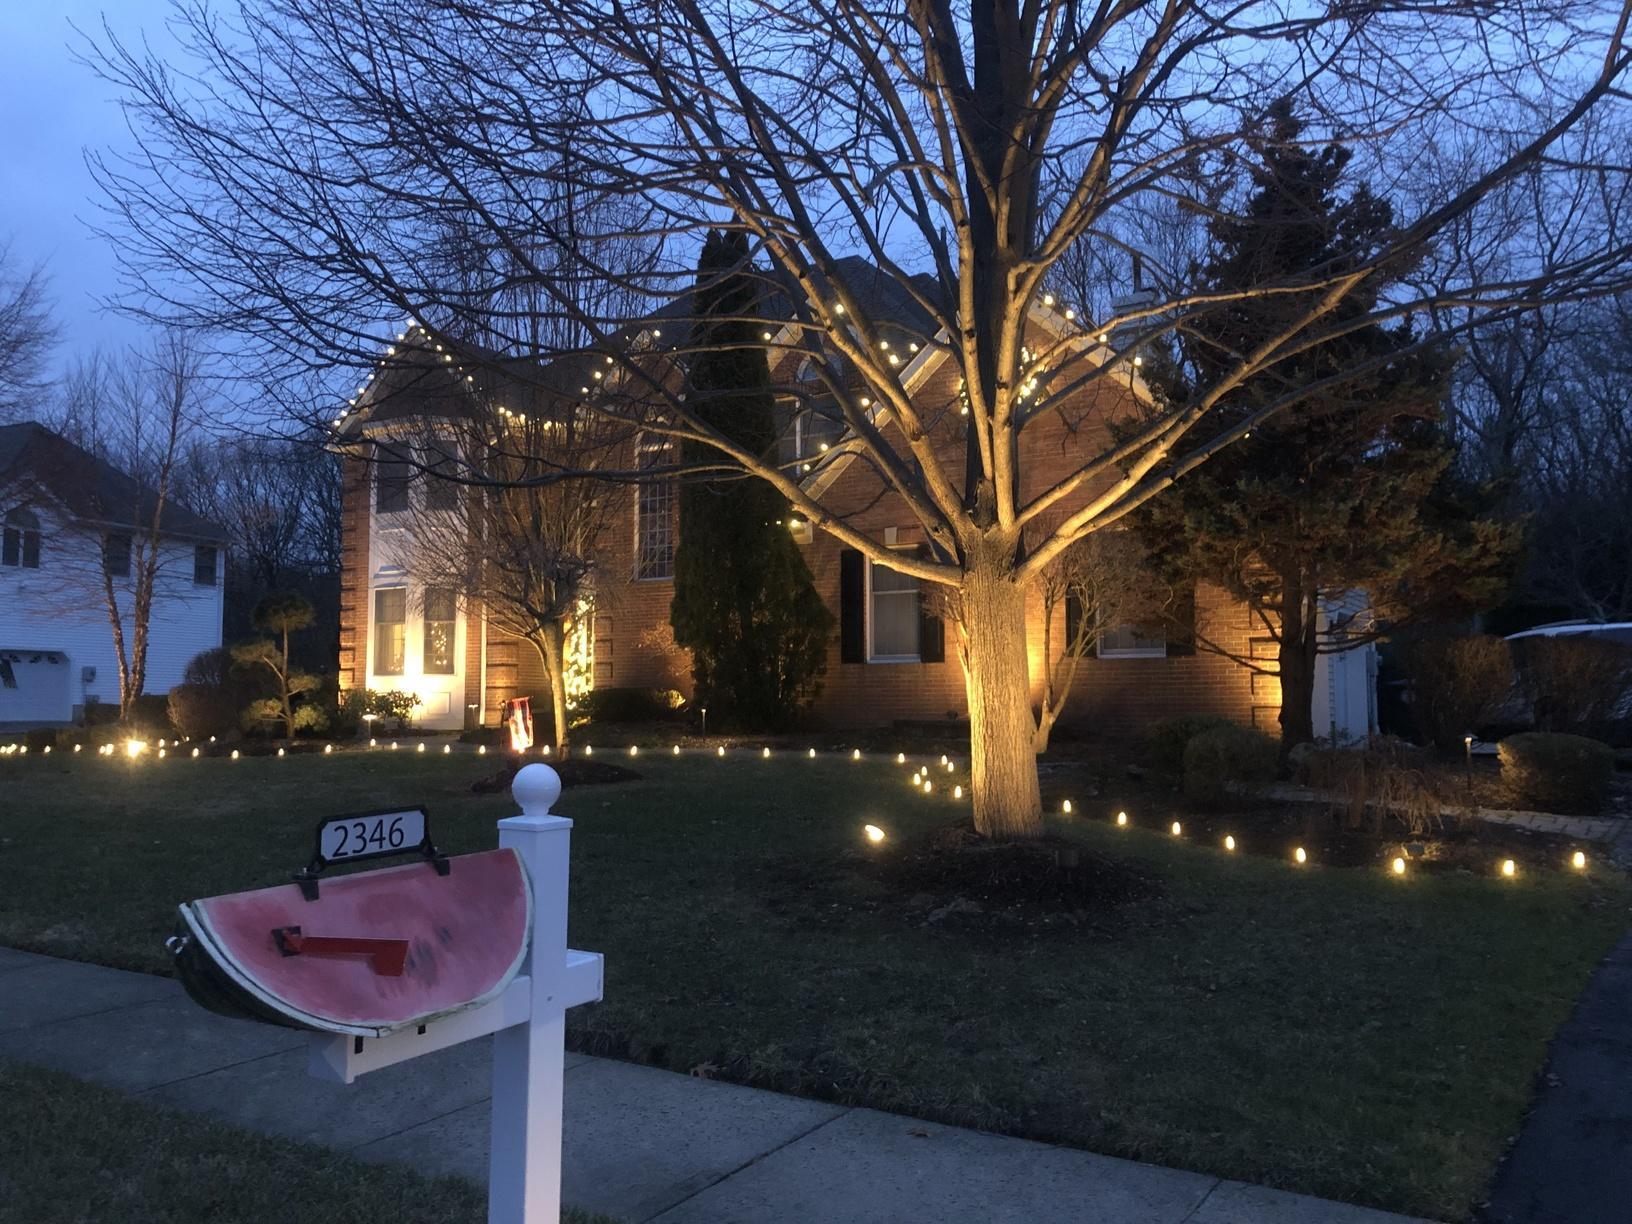 Professional Christmas Decorating in Manasquan, NJ